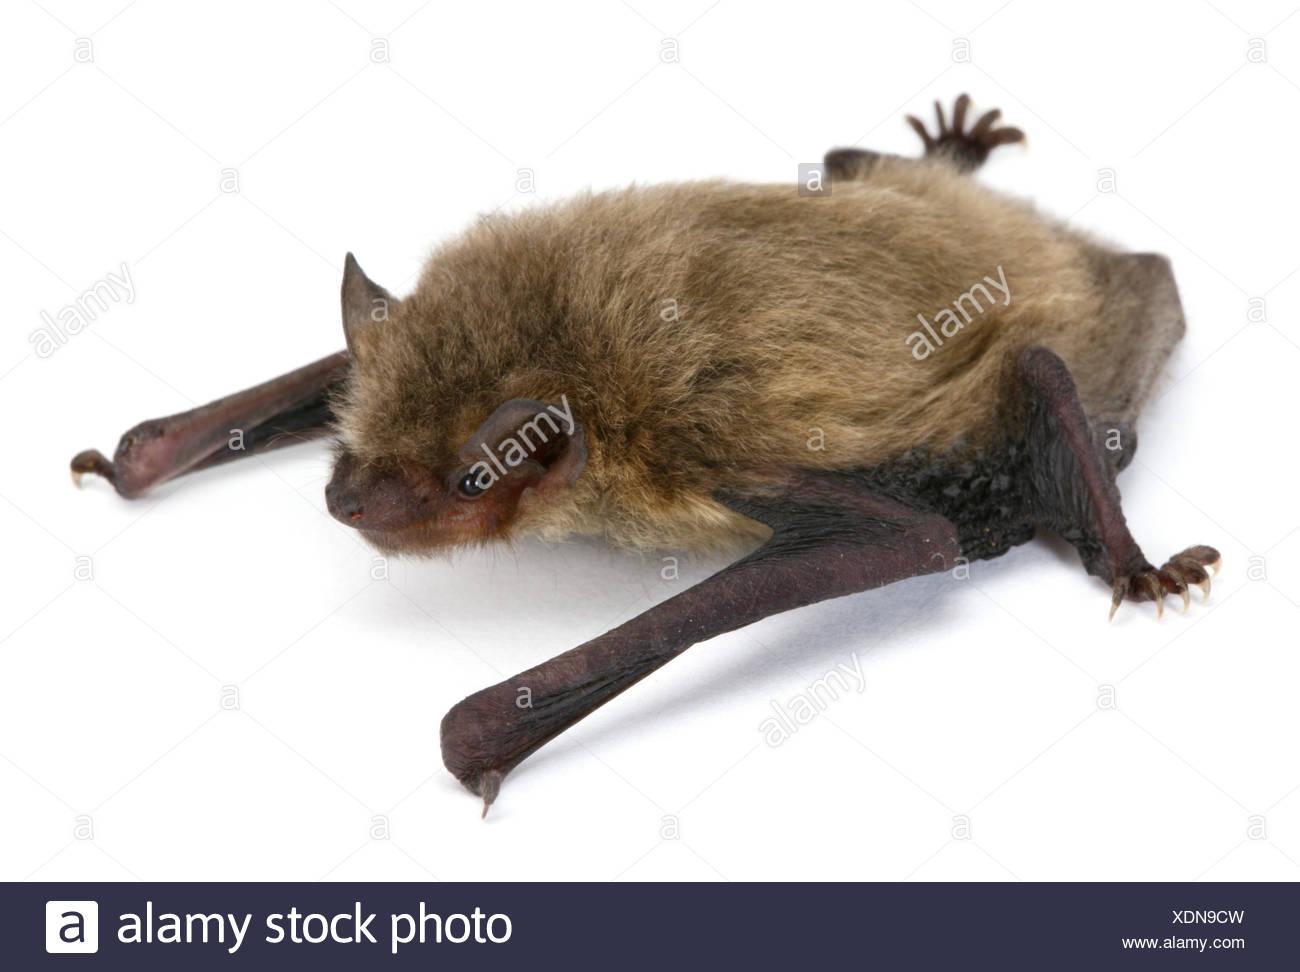 pipistrelle bat uk stock photos pipistrelle bat uk stock images